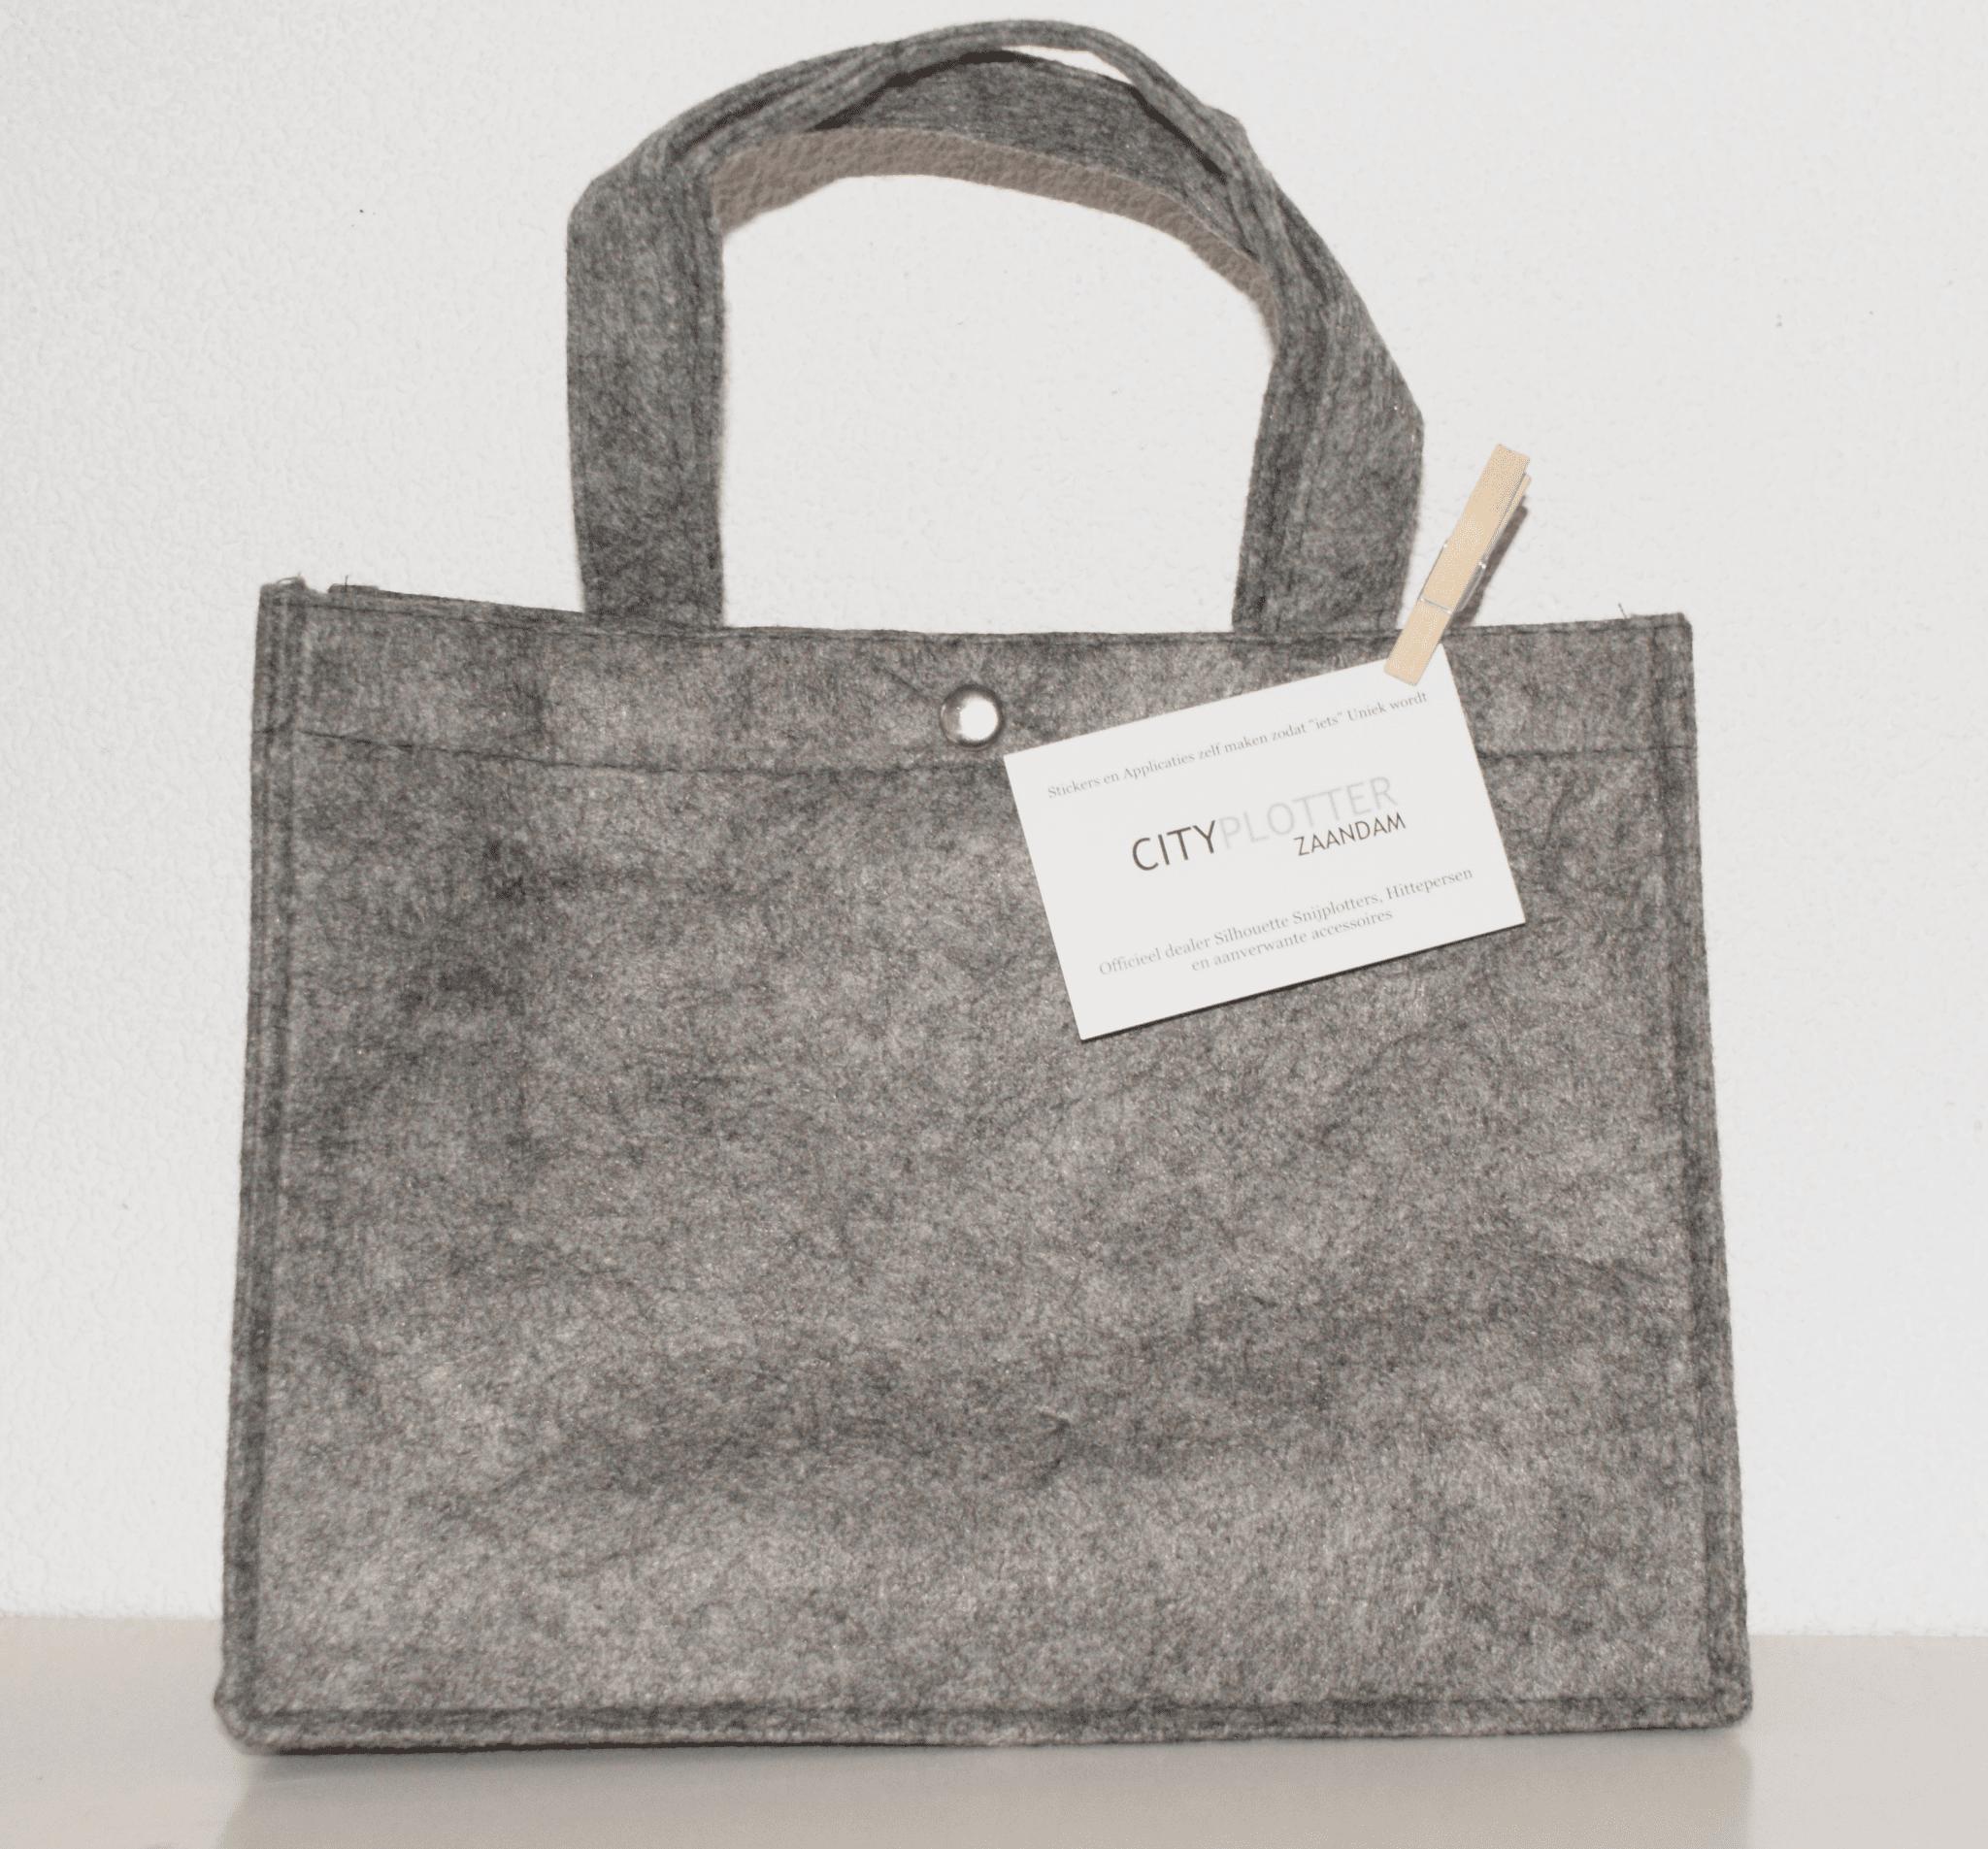 Tas tasjes vilt donker grijs klein met drukknoop bag shopper tassen felt dark grey small Cityplotter Zaandam